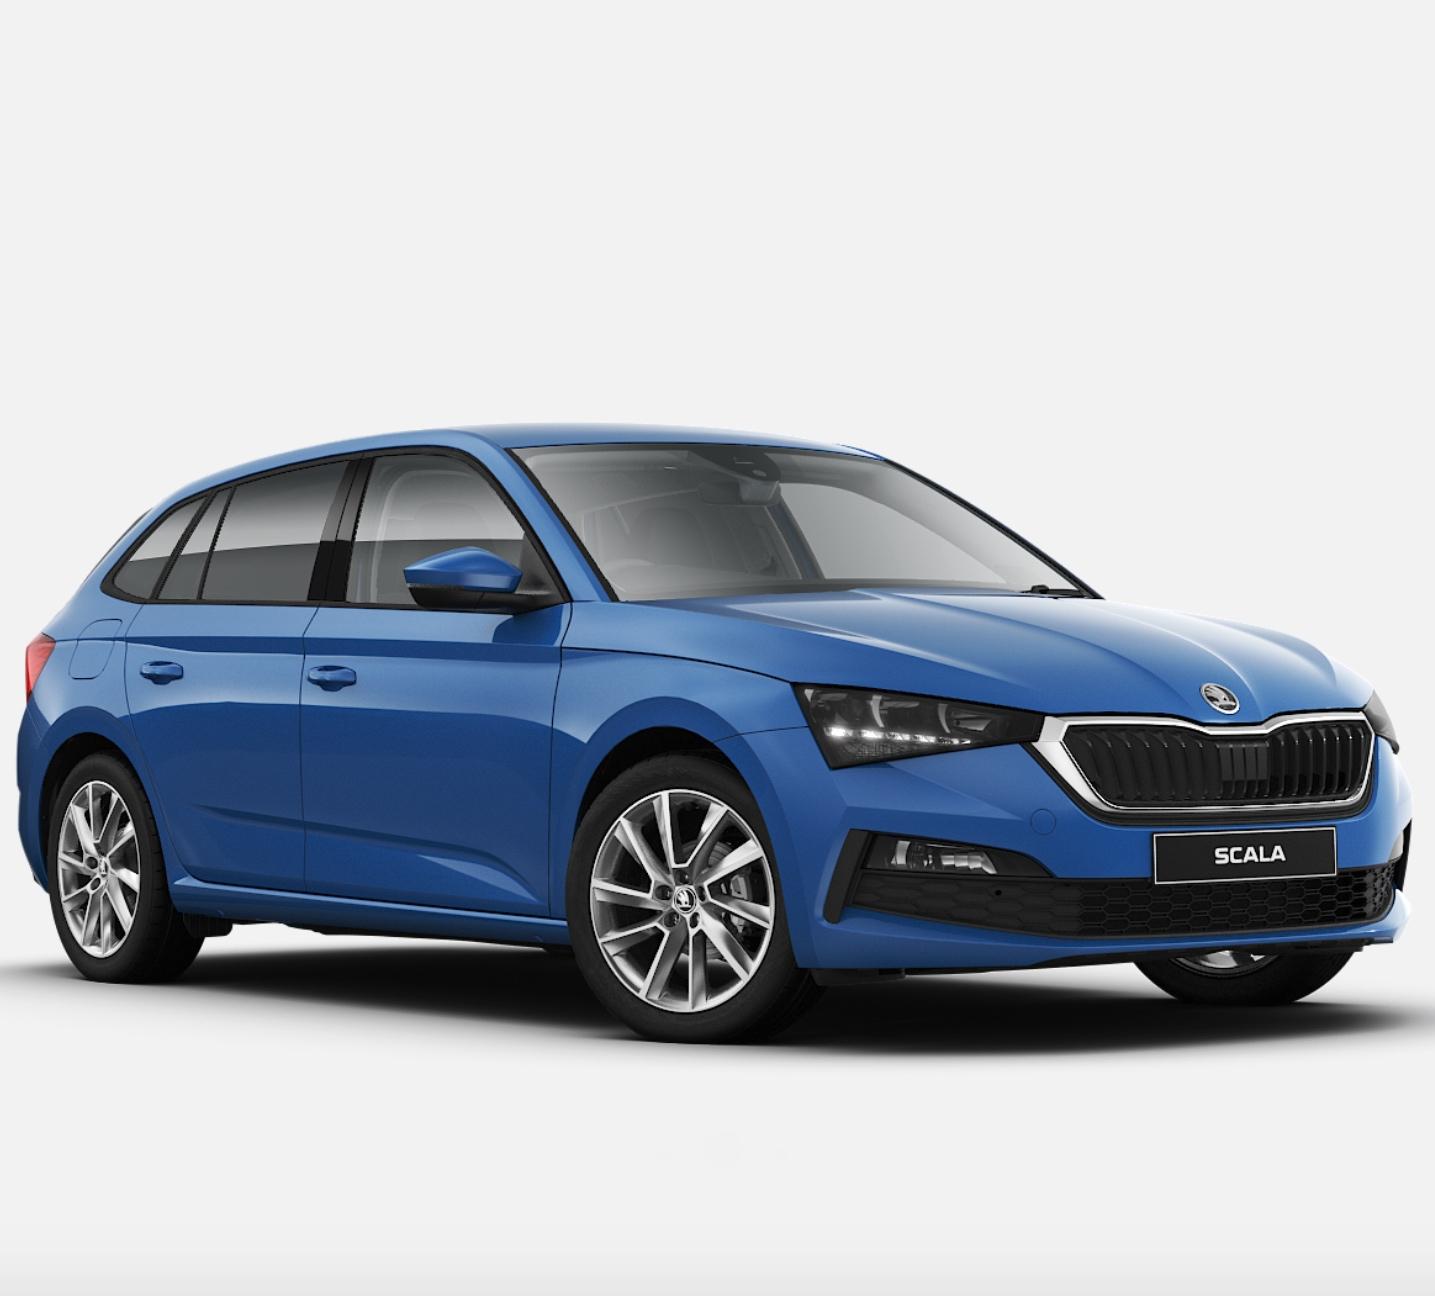 24 month Lease (6+23) - Skoda Scala Hatchback 1.0 TSI 95 SE L 5k miles p/a - £149.98pm + £900 initial + £150 admin = £4499 @ Leasing Options